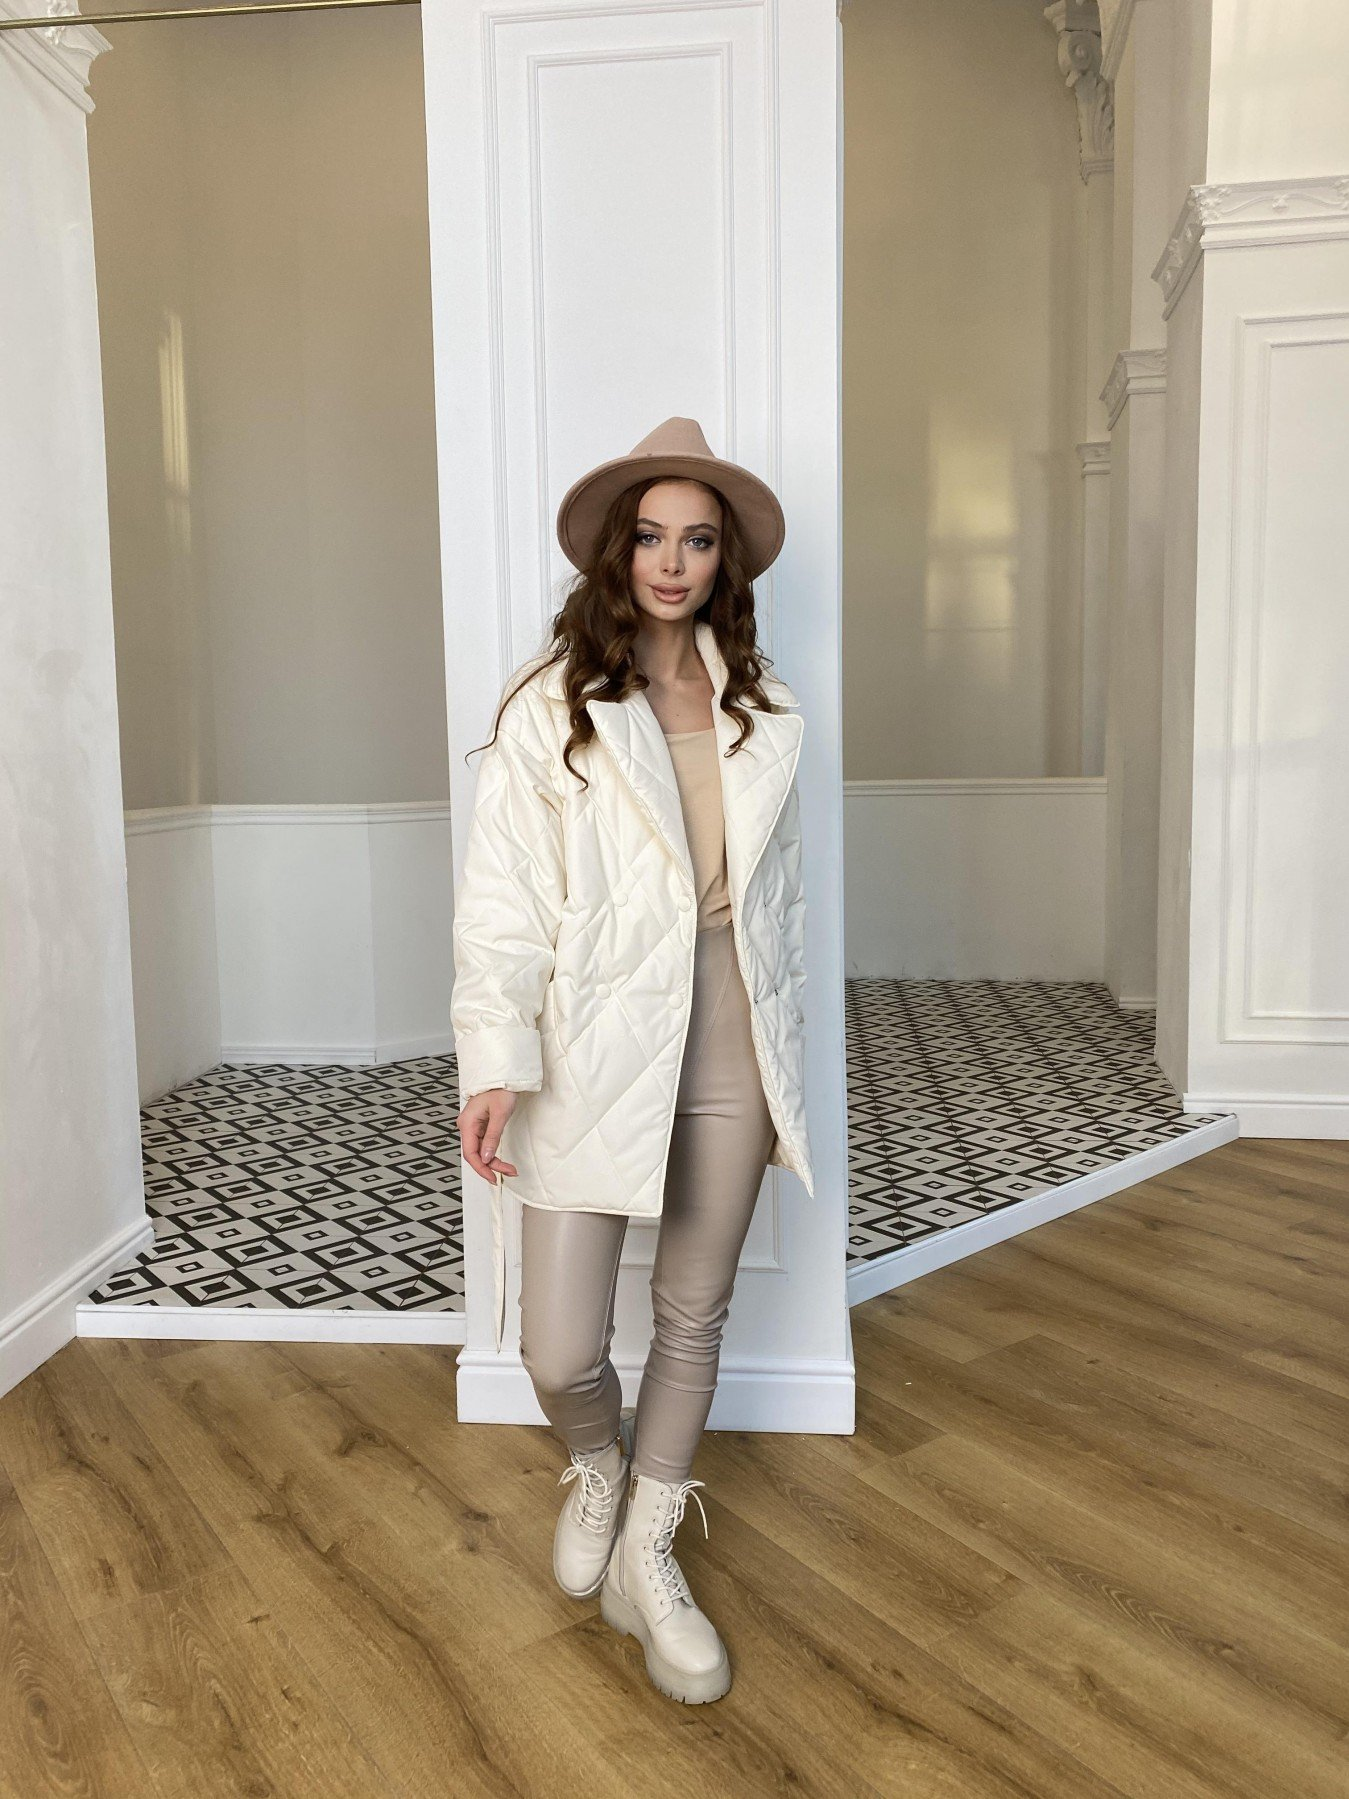 Норд Бат стеганая куртка из плащевки Ammy  10947 АРТ. 47435 Цвет: Молоко - фото 2, интернет магазин tm-modus.ru